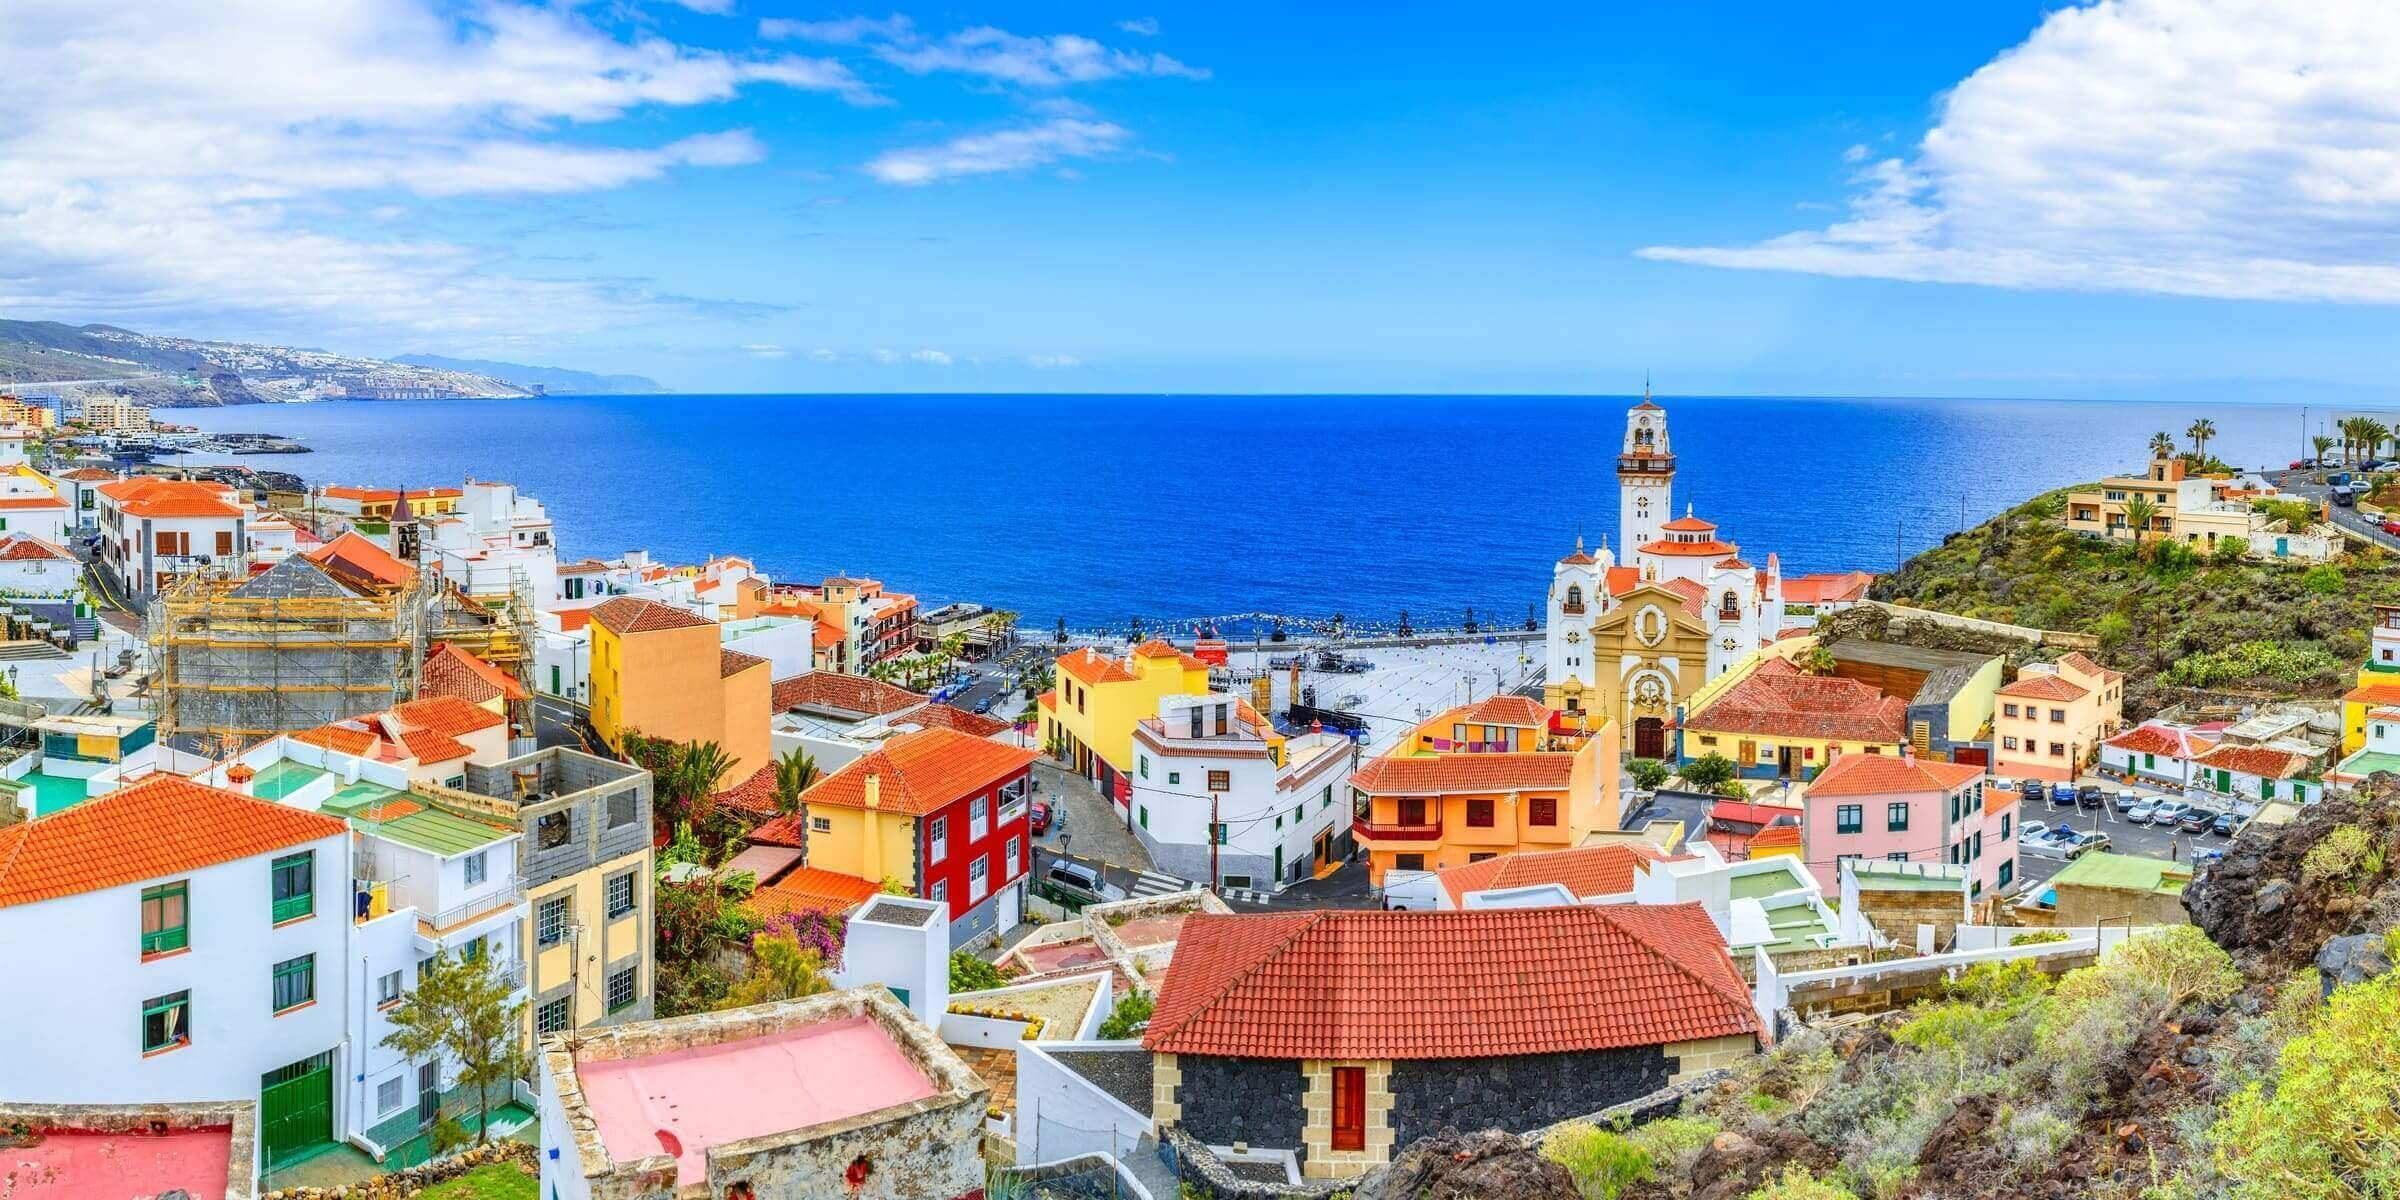 Singlereise nach Teneriffa - Candelaria